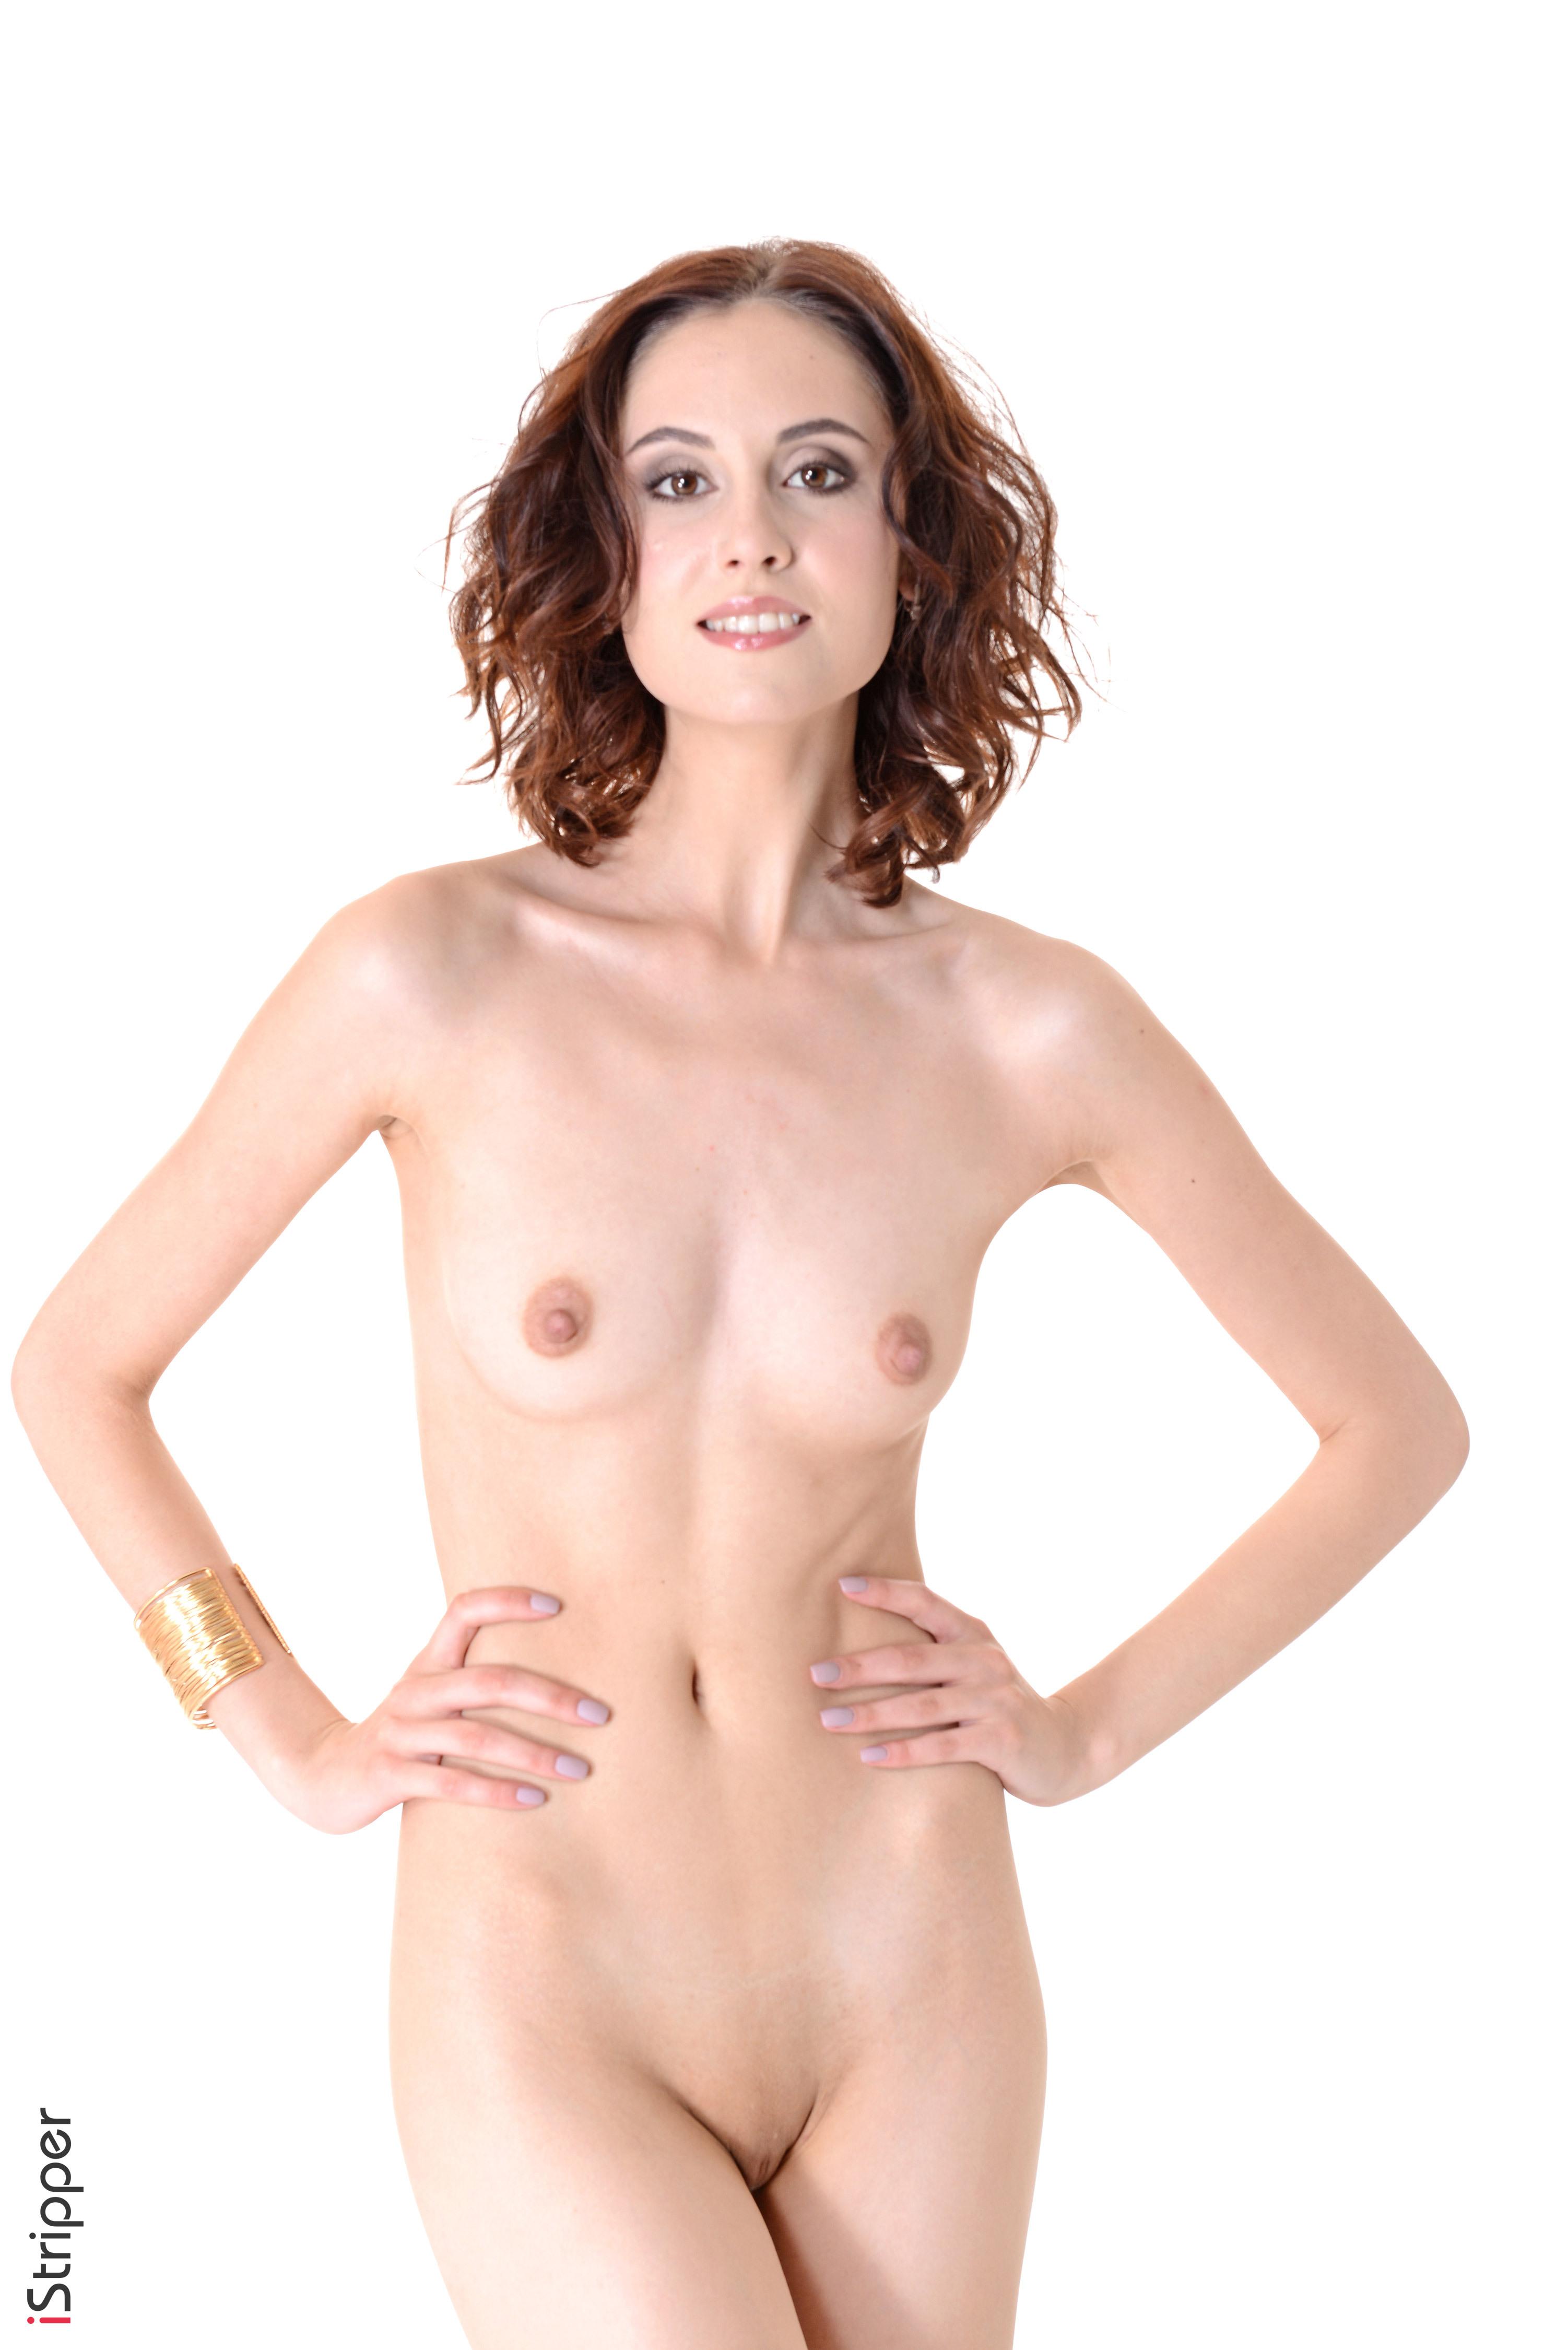 tori black nude wallpaper